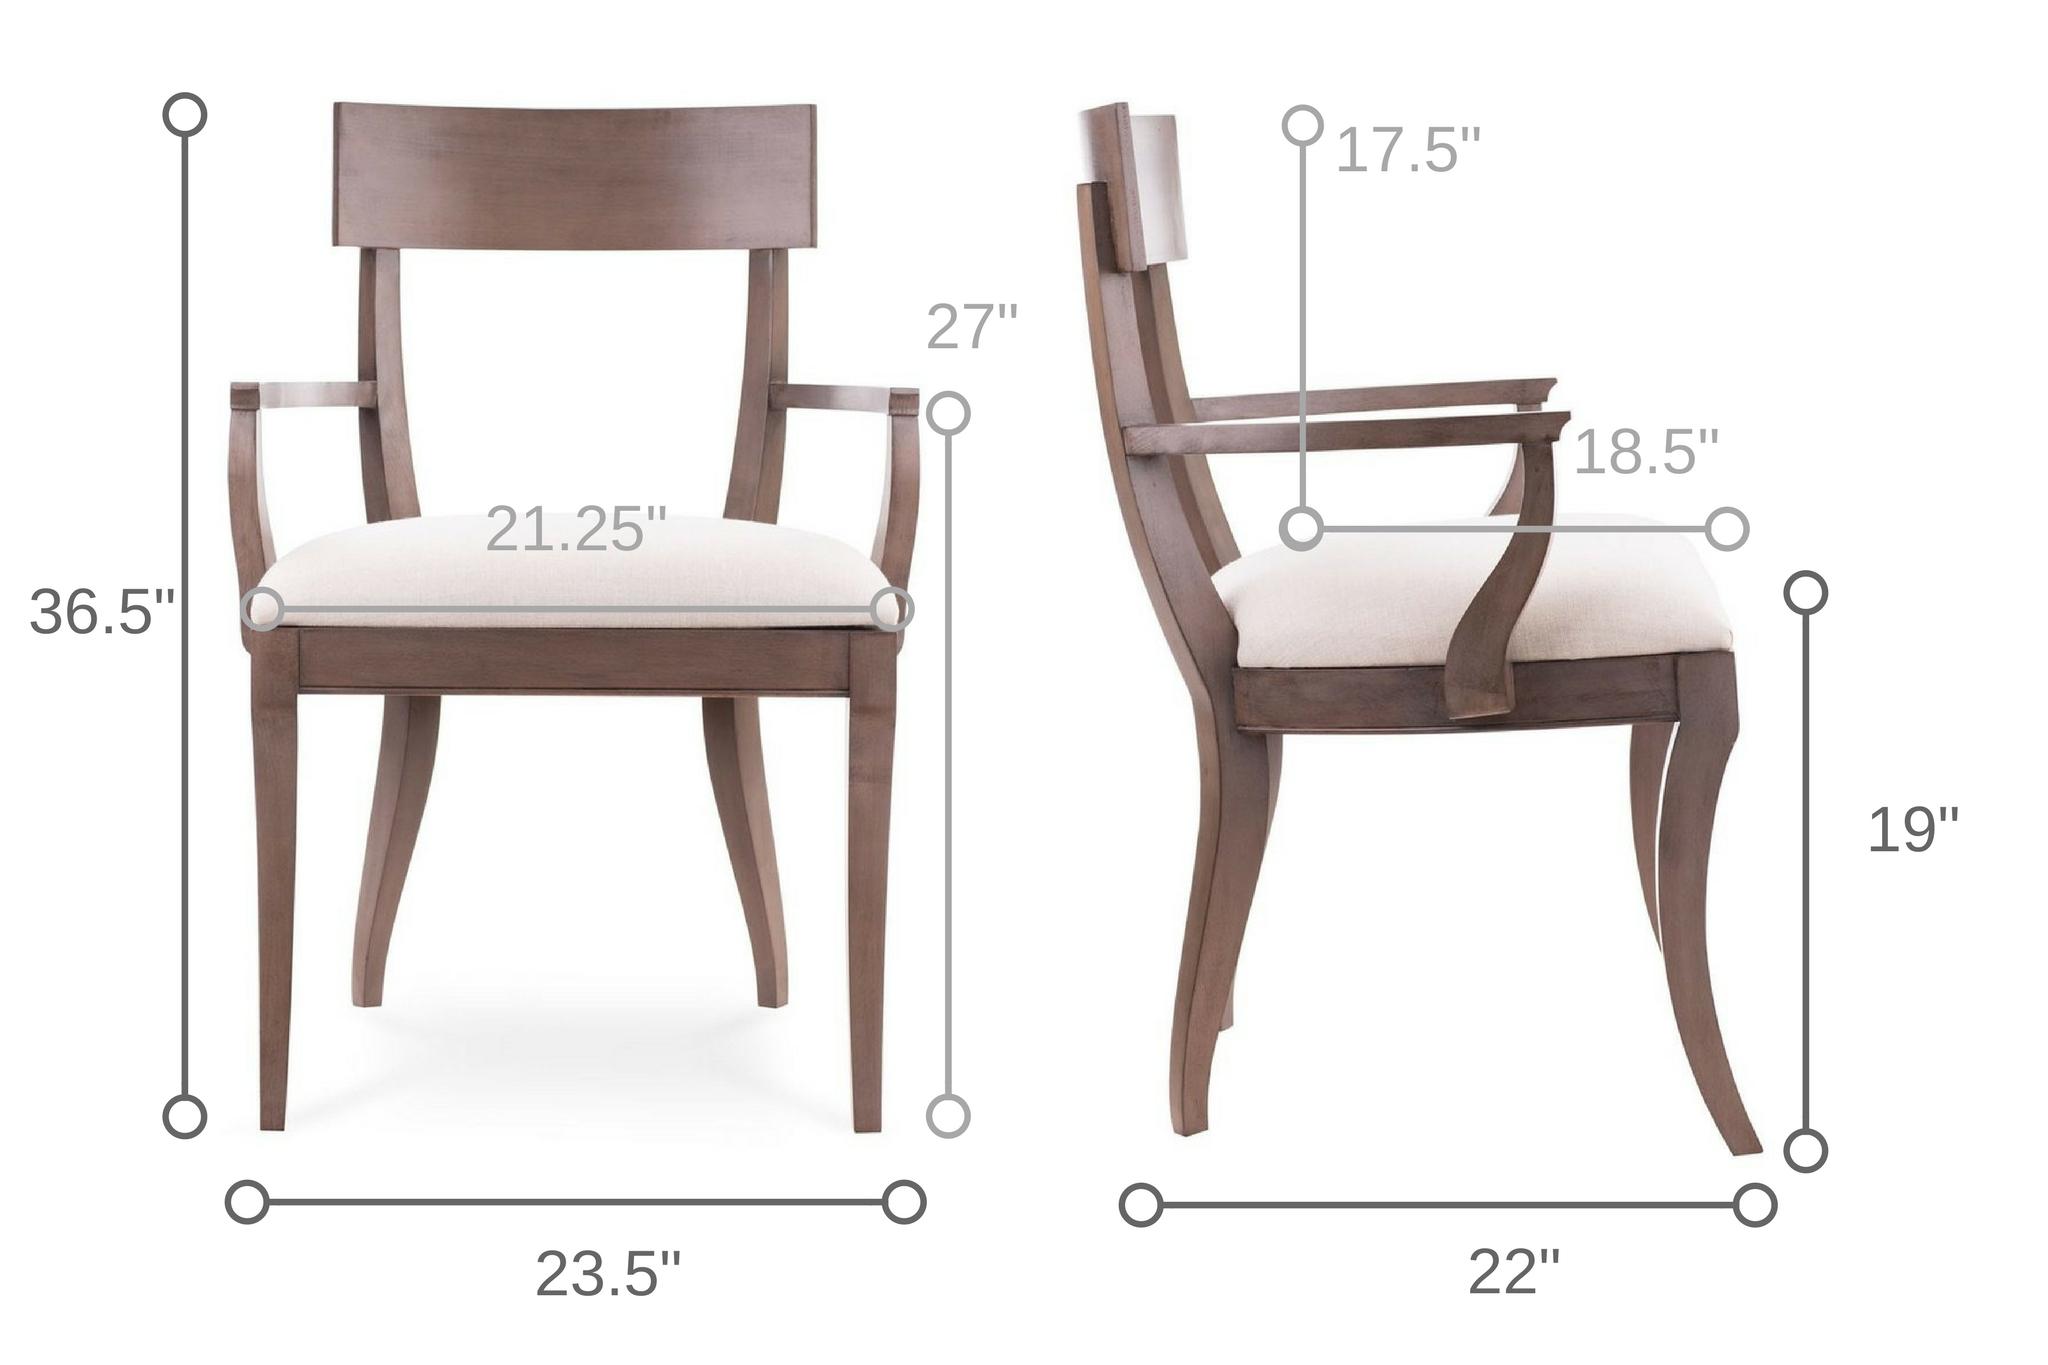 Dowel Furniture Grace Klismos Arm Chair Dimensions